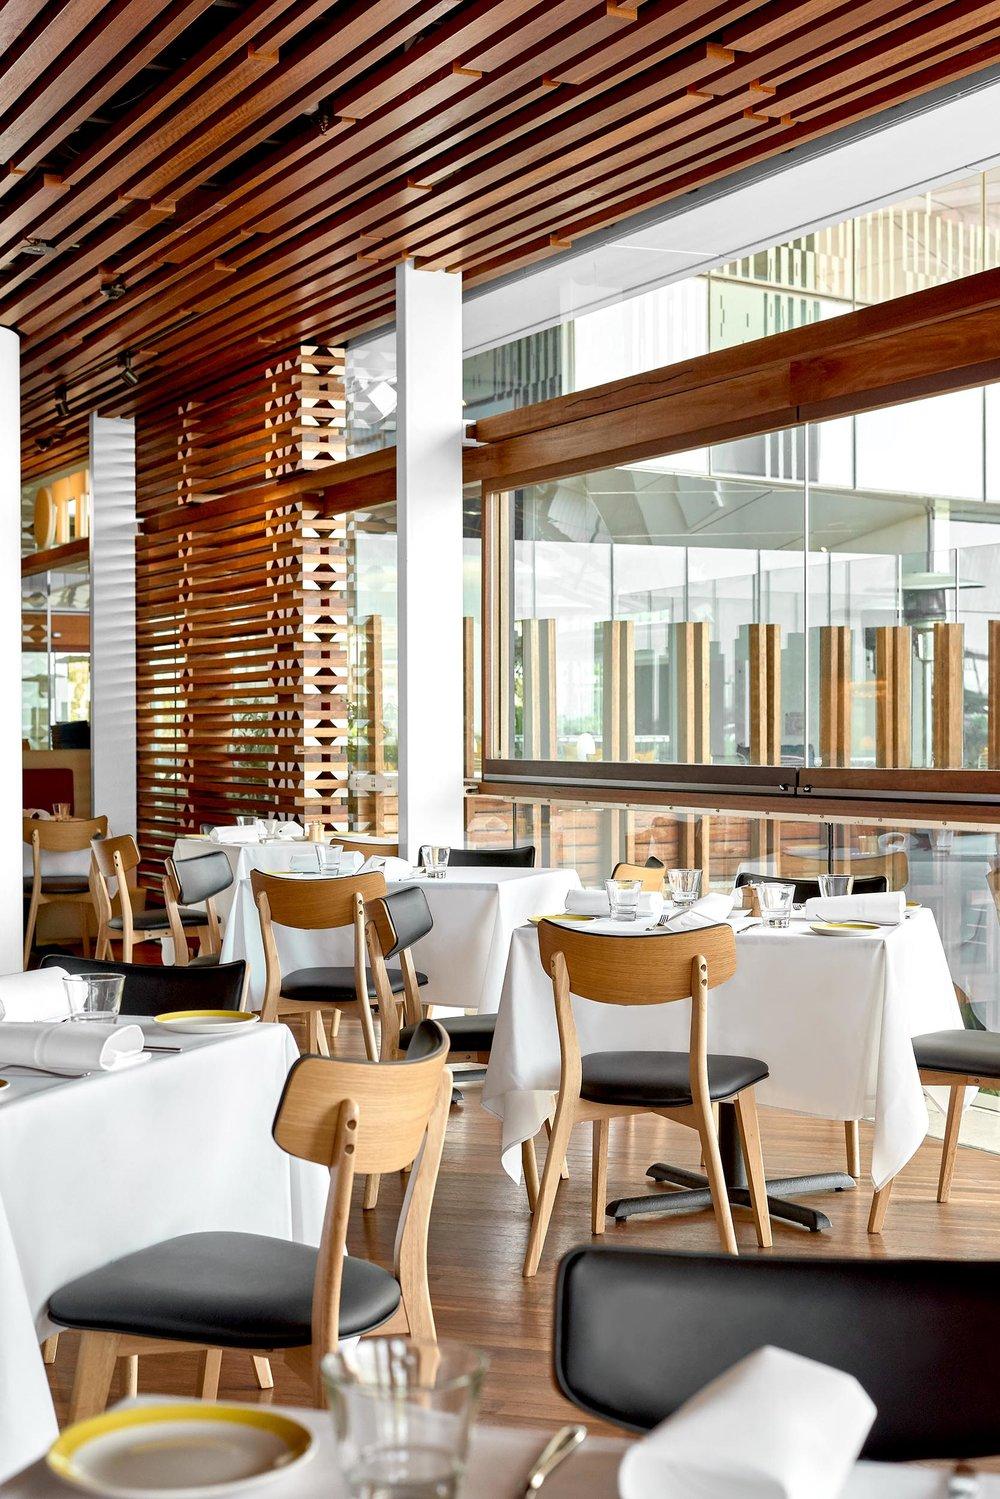 Architectural Interior OTTO Restaurant - Brisbane Advertising Photography, Brisbane Commercial Photography.jpg